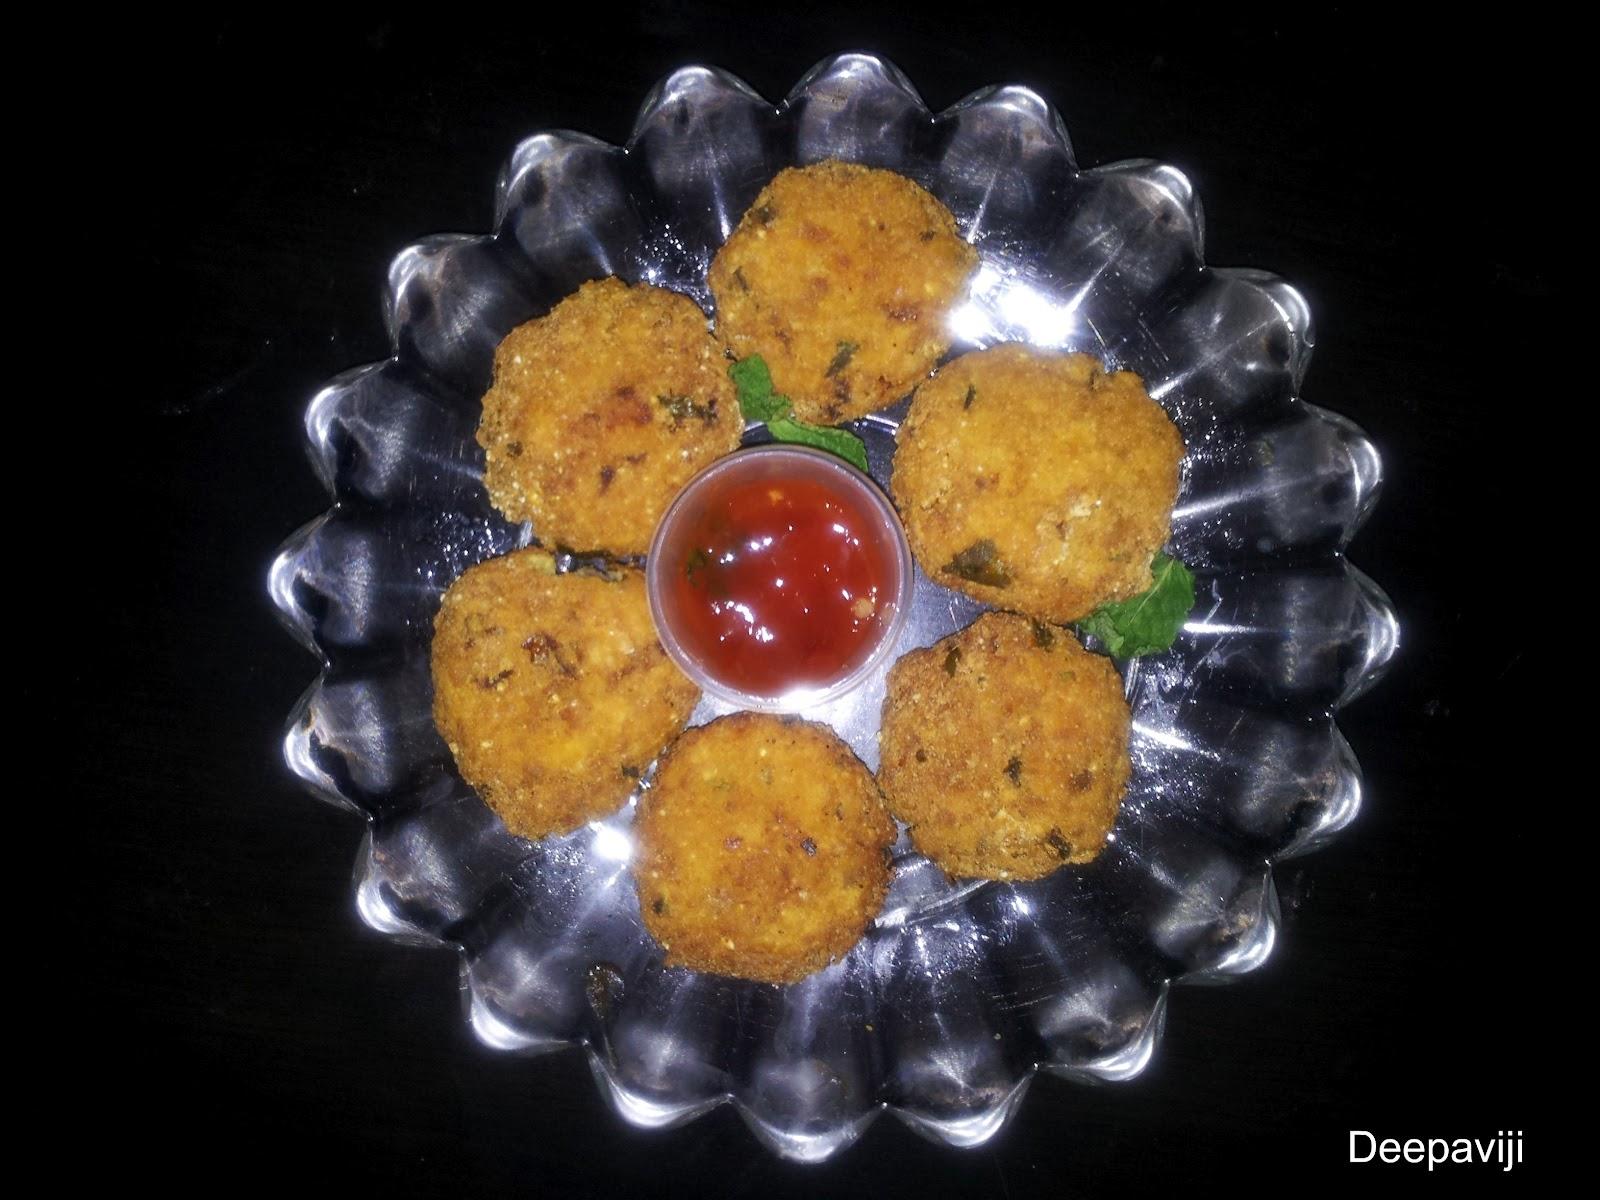 http://foodandbeyondfans.blogspot.com/2012/08/toffu-vada_3.html